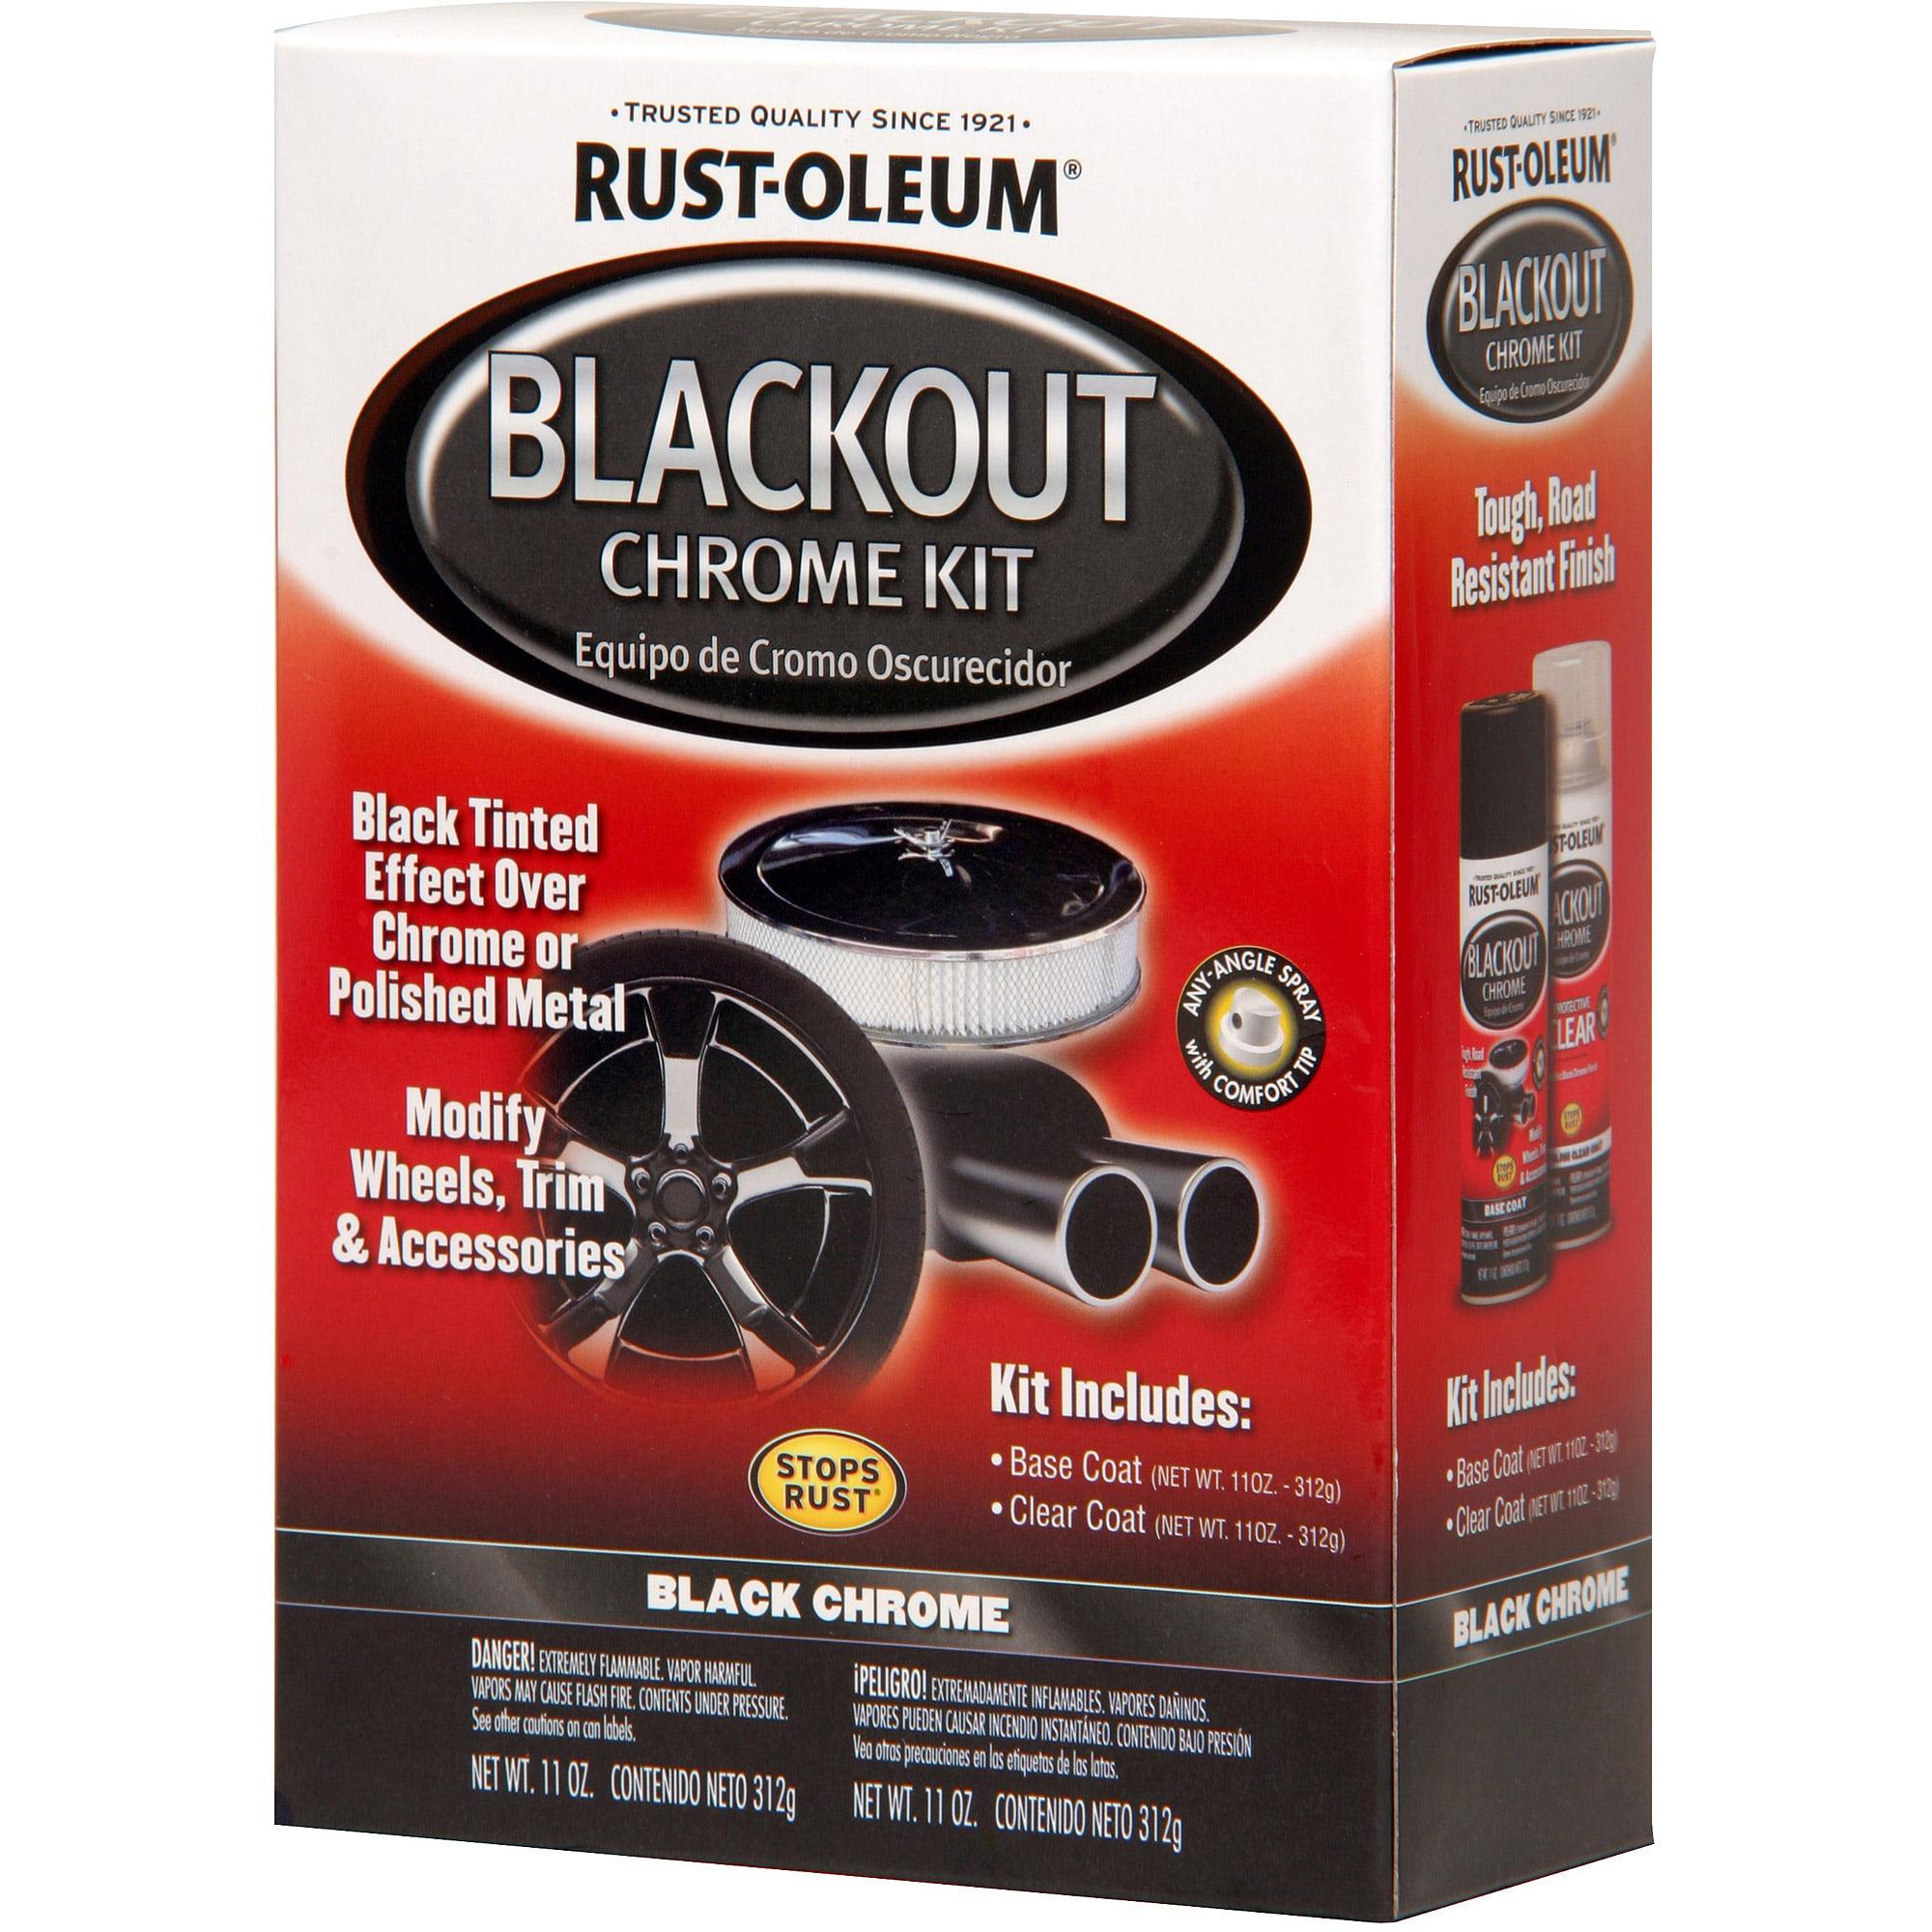 Rust-Oleum Blackout Chrome Kit